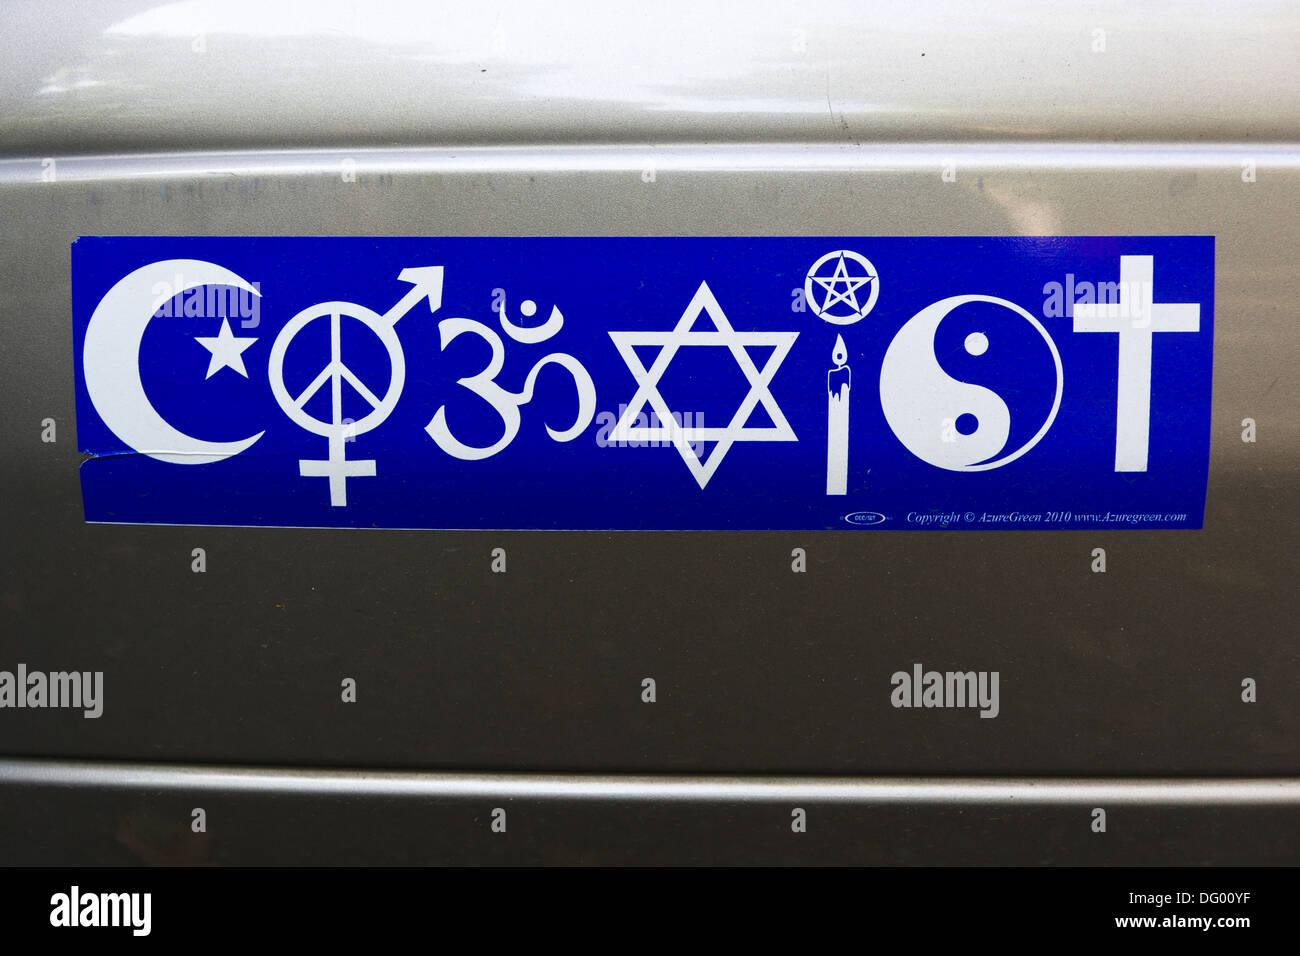 Koexistieren Sie Autoaufkleber mit Symbolen verschiedener Religionen. Stockbild